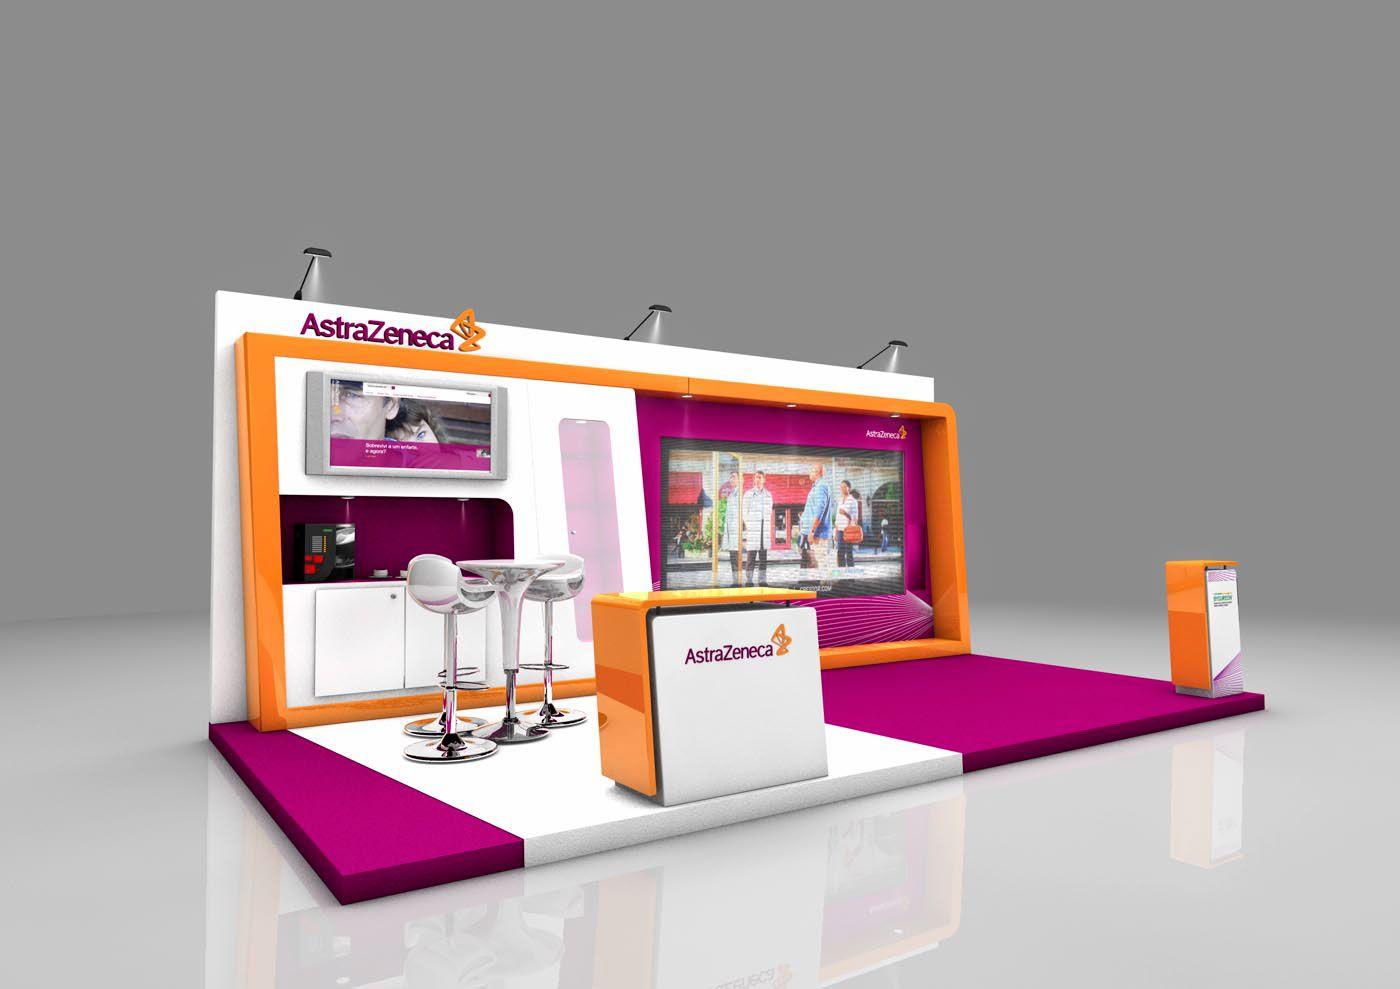 Exhibition Booth Design For Astrazeneca Exhibition Booth Booth Design Exhibition Stand Design